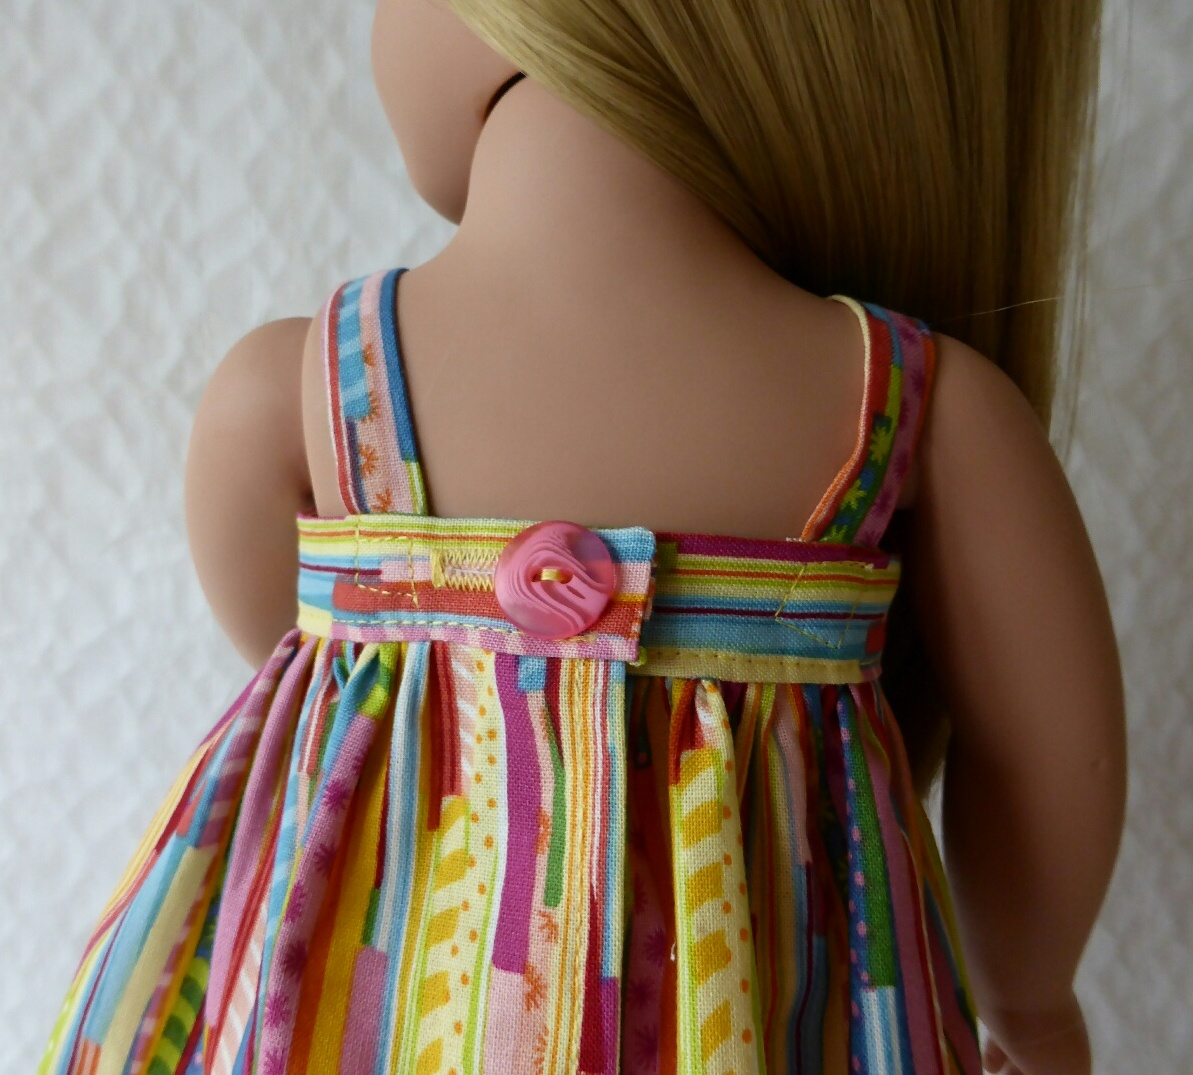 Katy Handkerchief Top Back